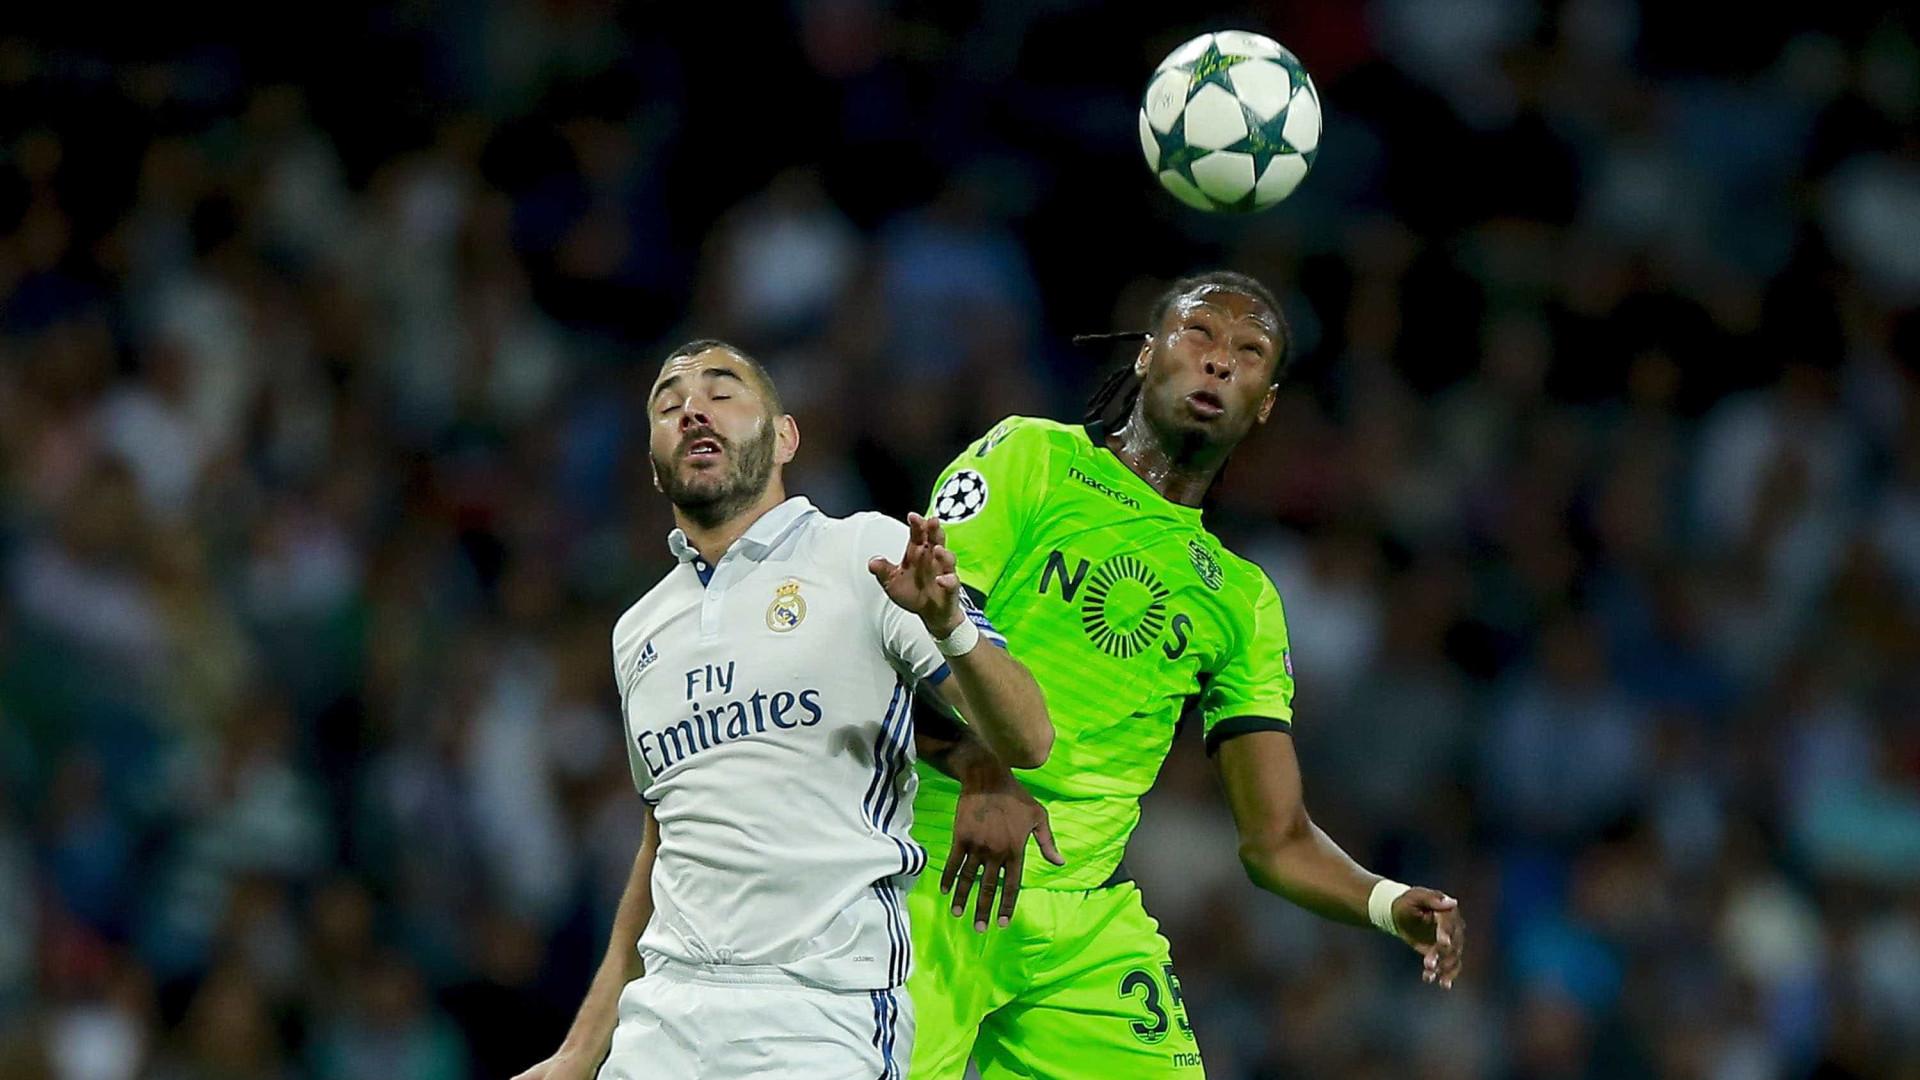 Empresário de Rúben Semedo nega transferência para Newcastle — Mercado